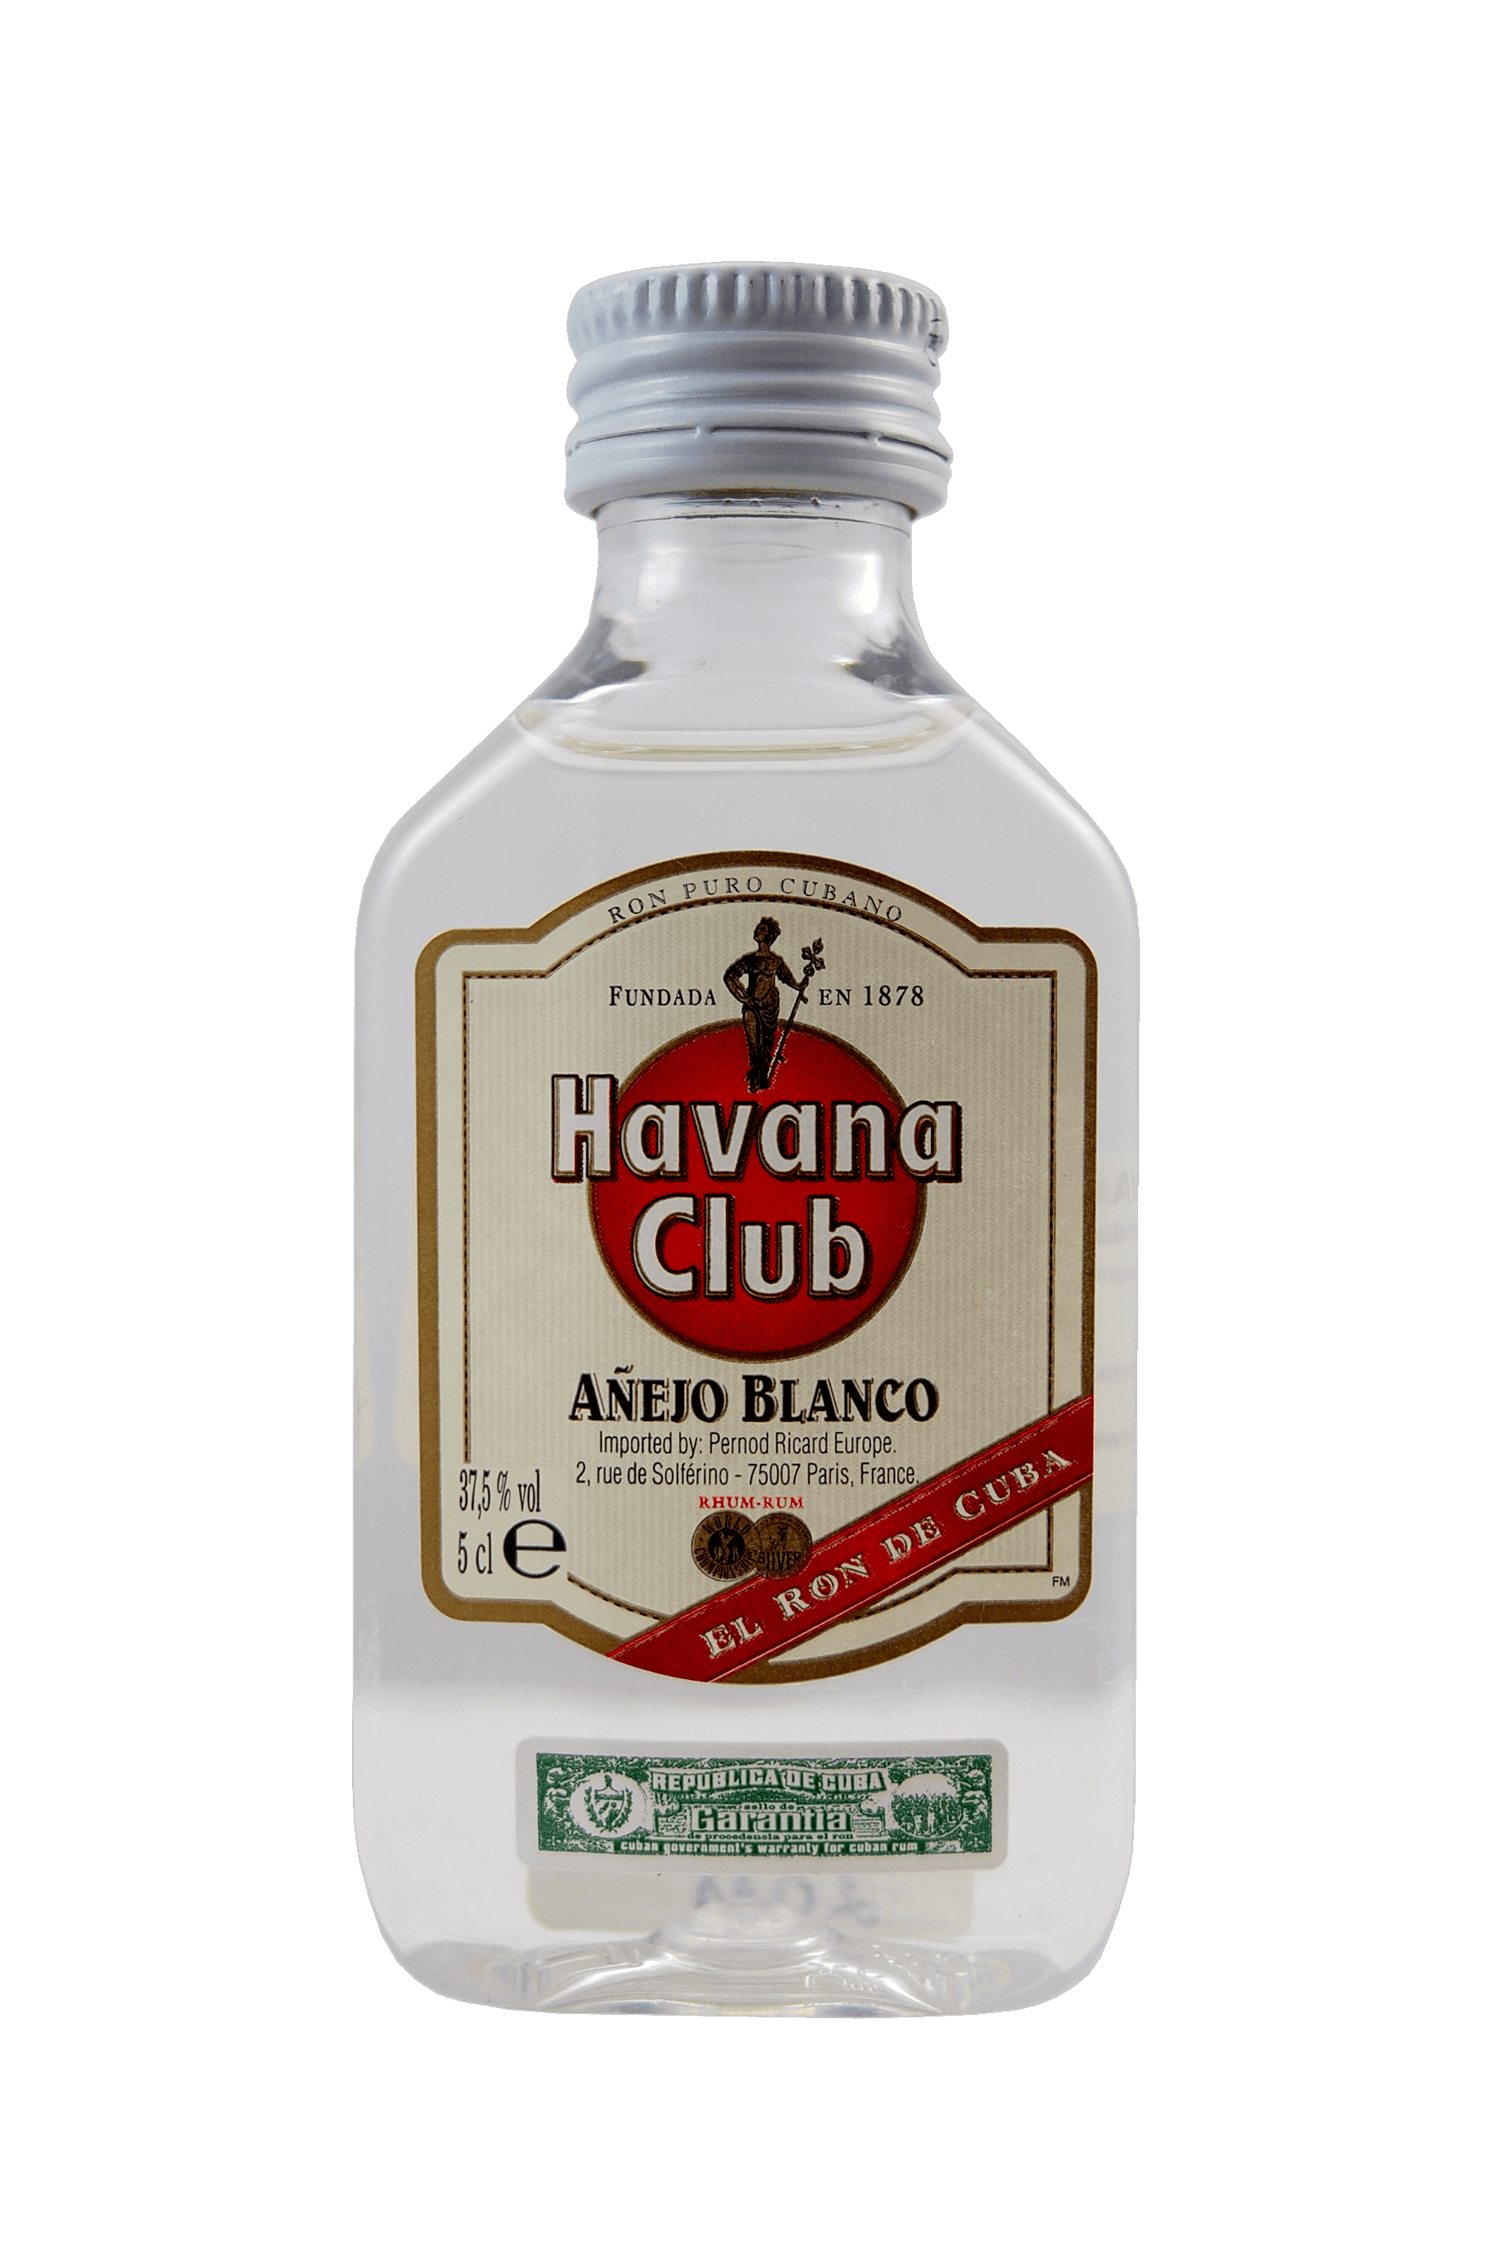 Havana Club Blanco